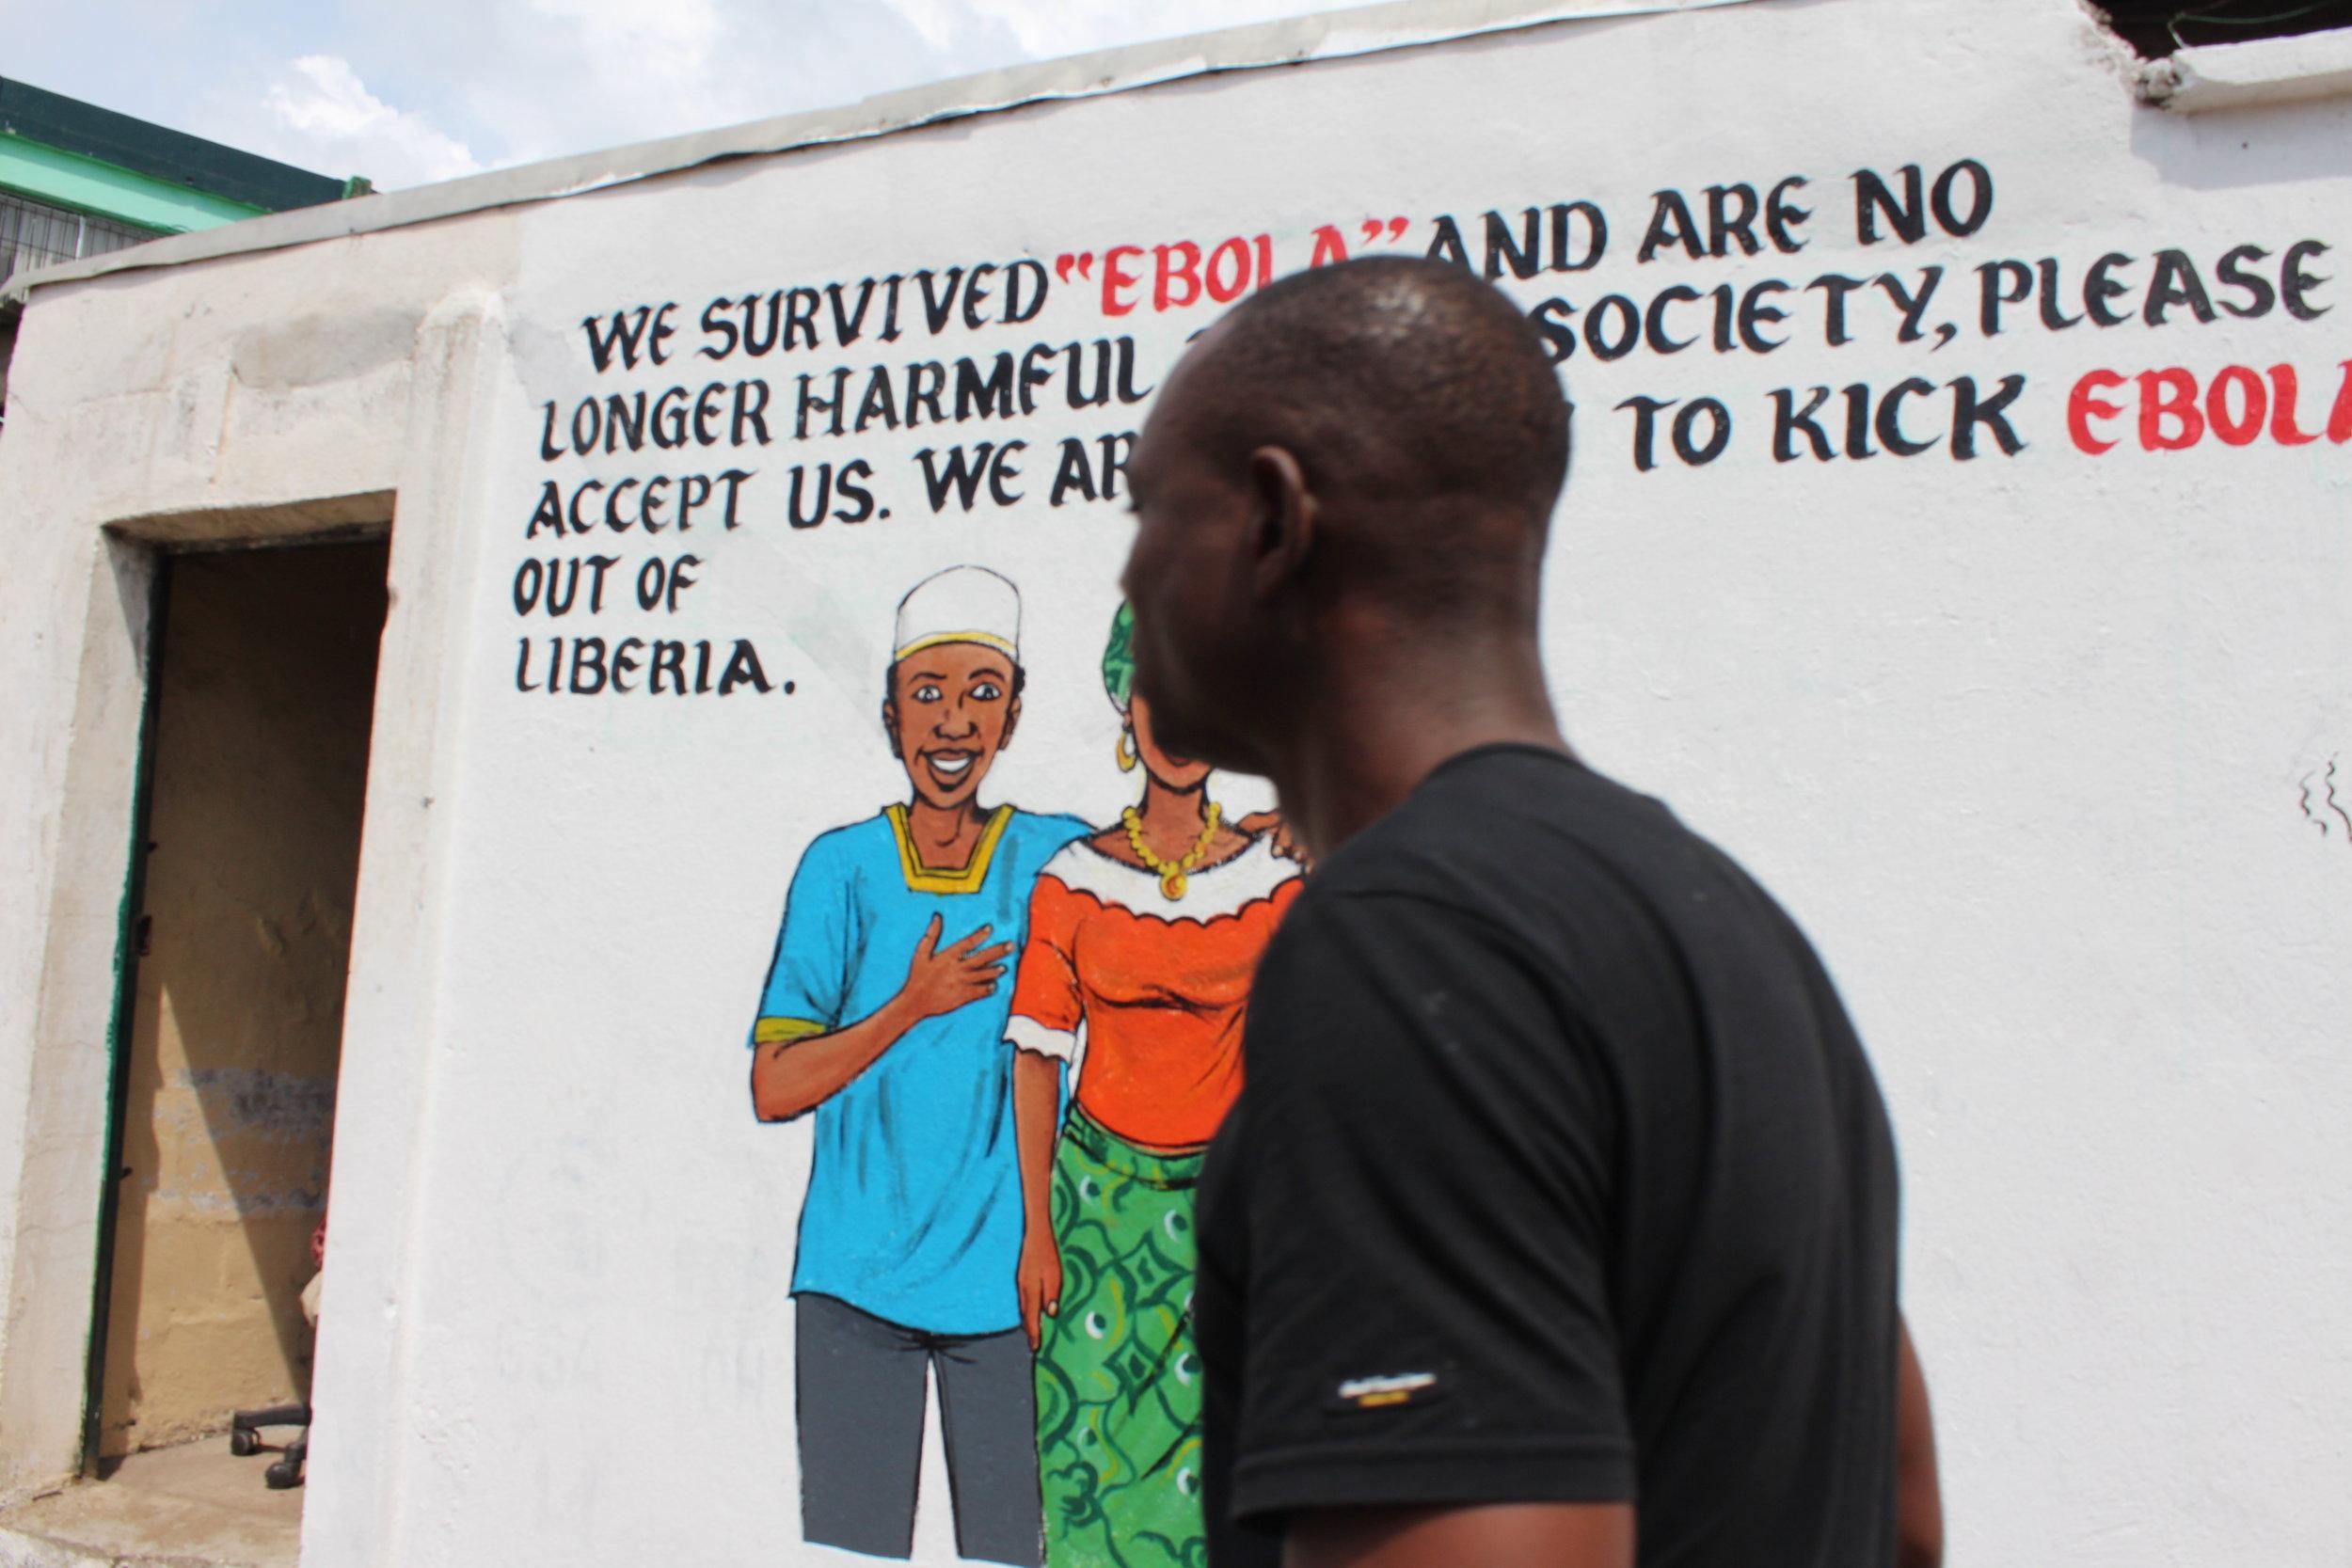 Ebola street sign.8.JPG